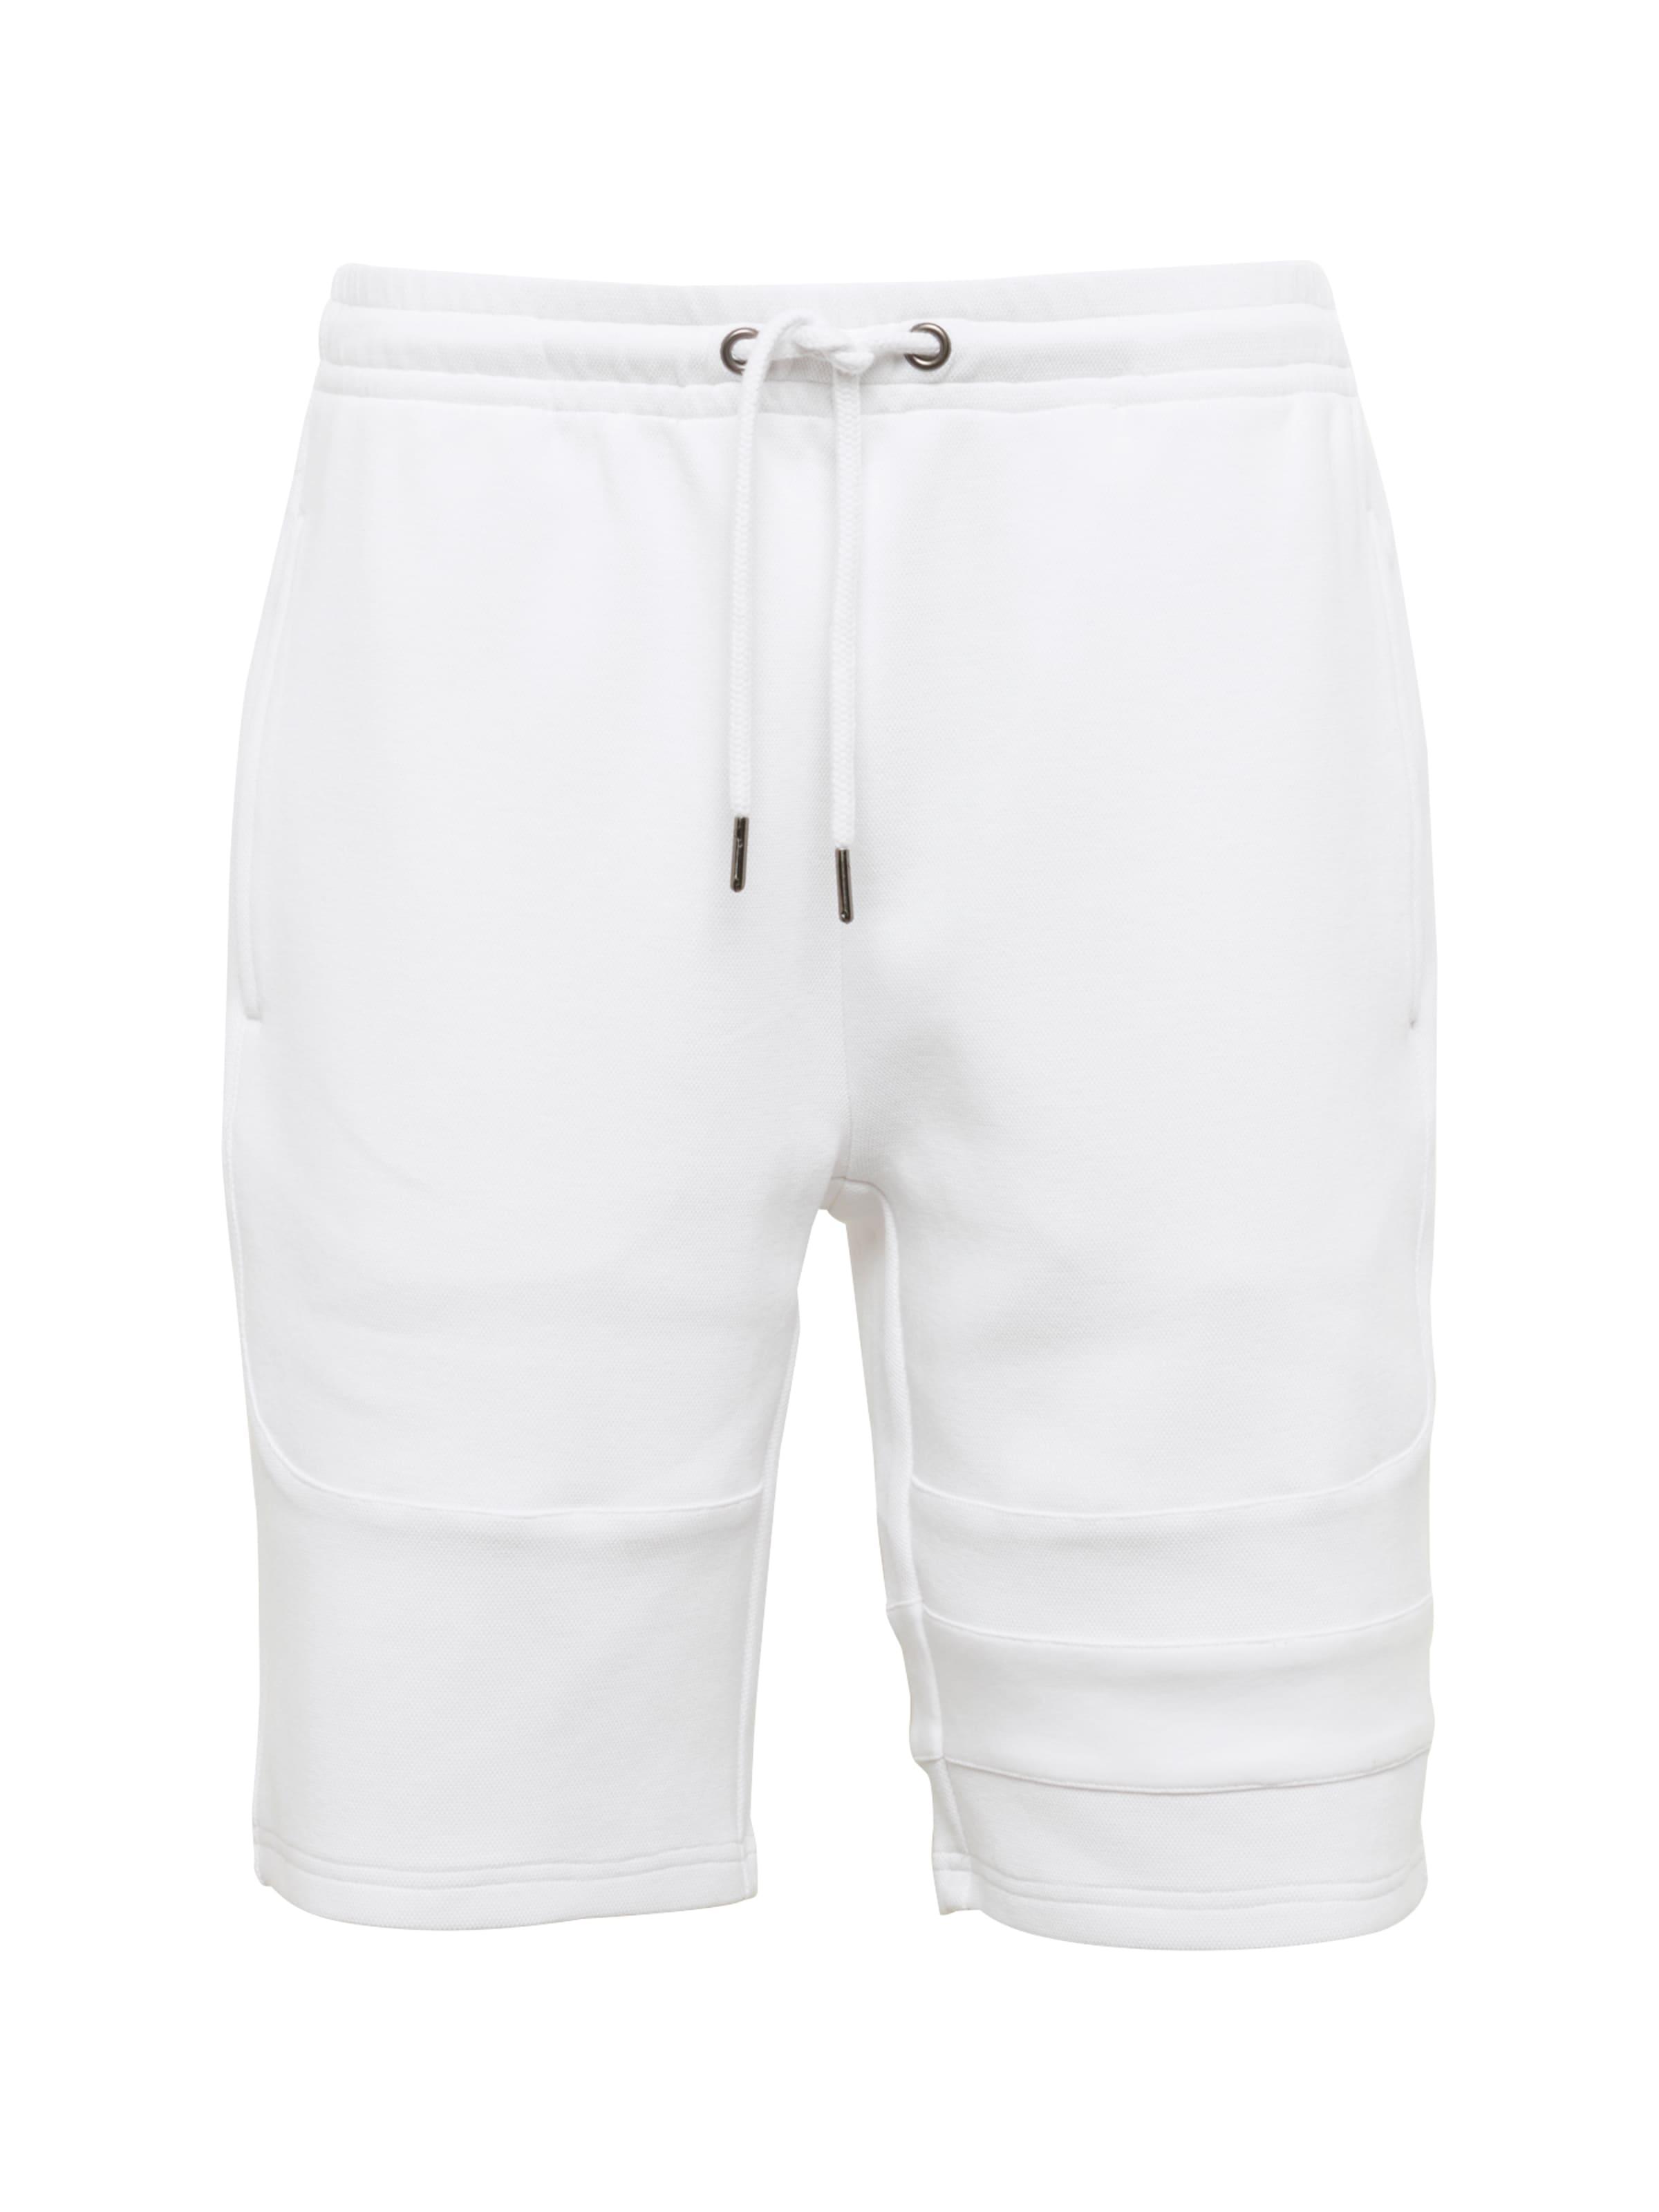 Shorts' Classics Hose Urban Weiß Pique 'heavy In OvNm0y8nwP